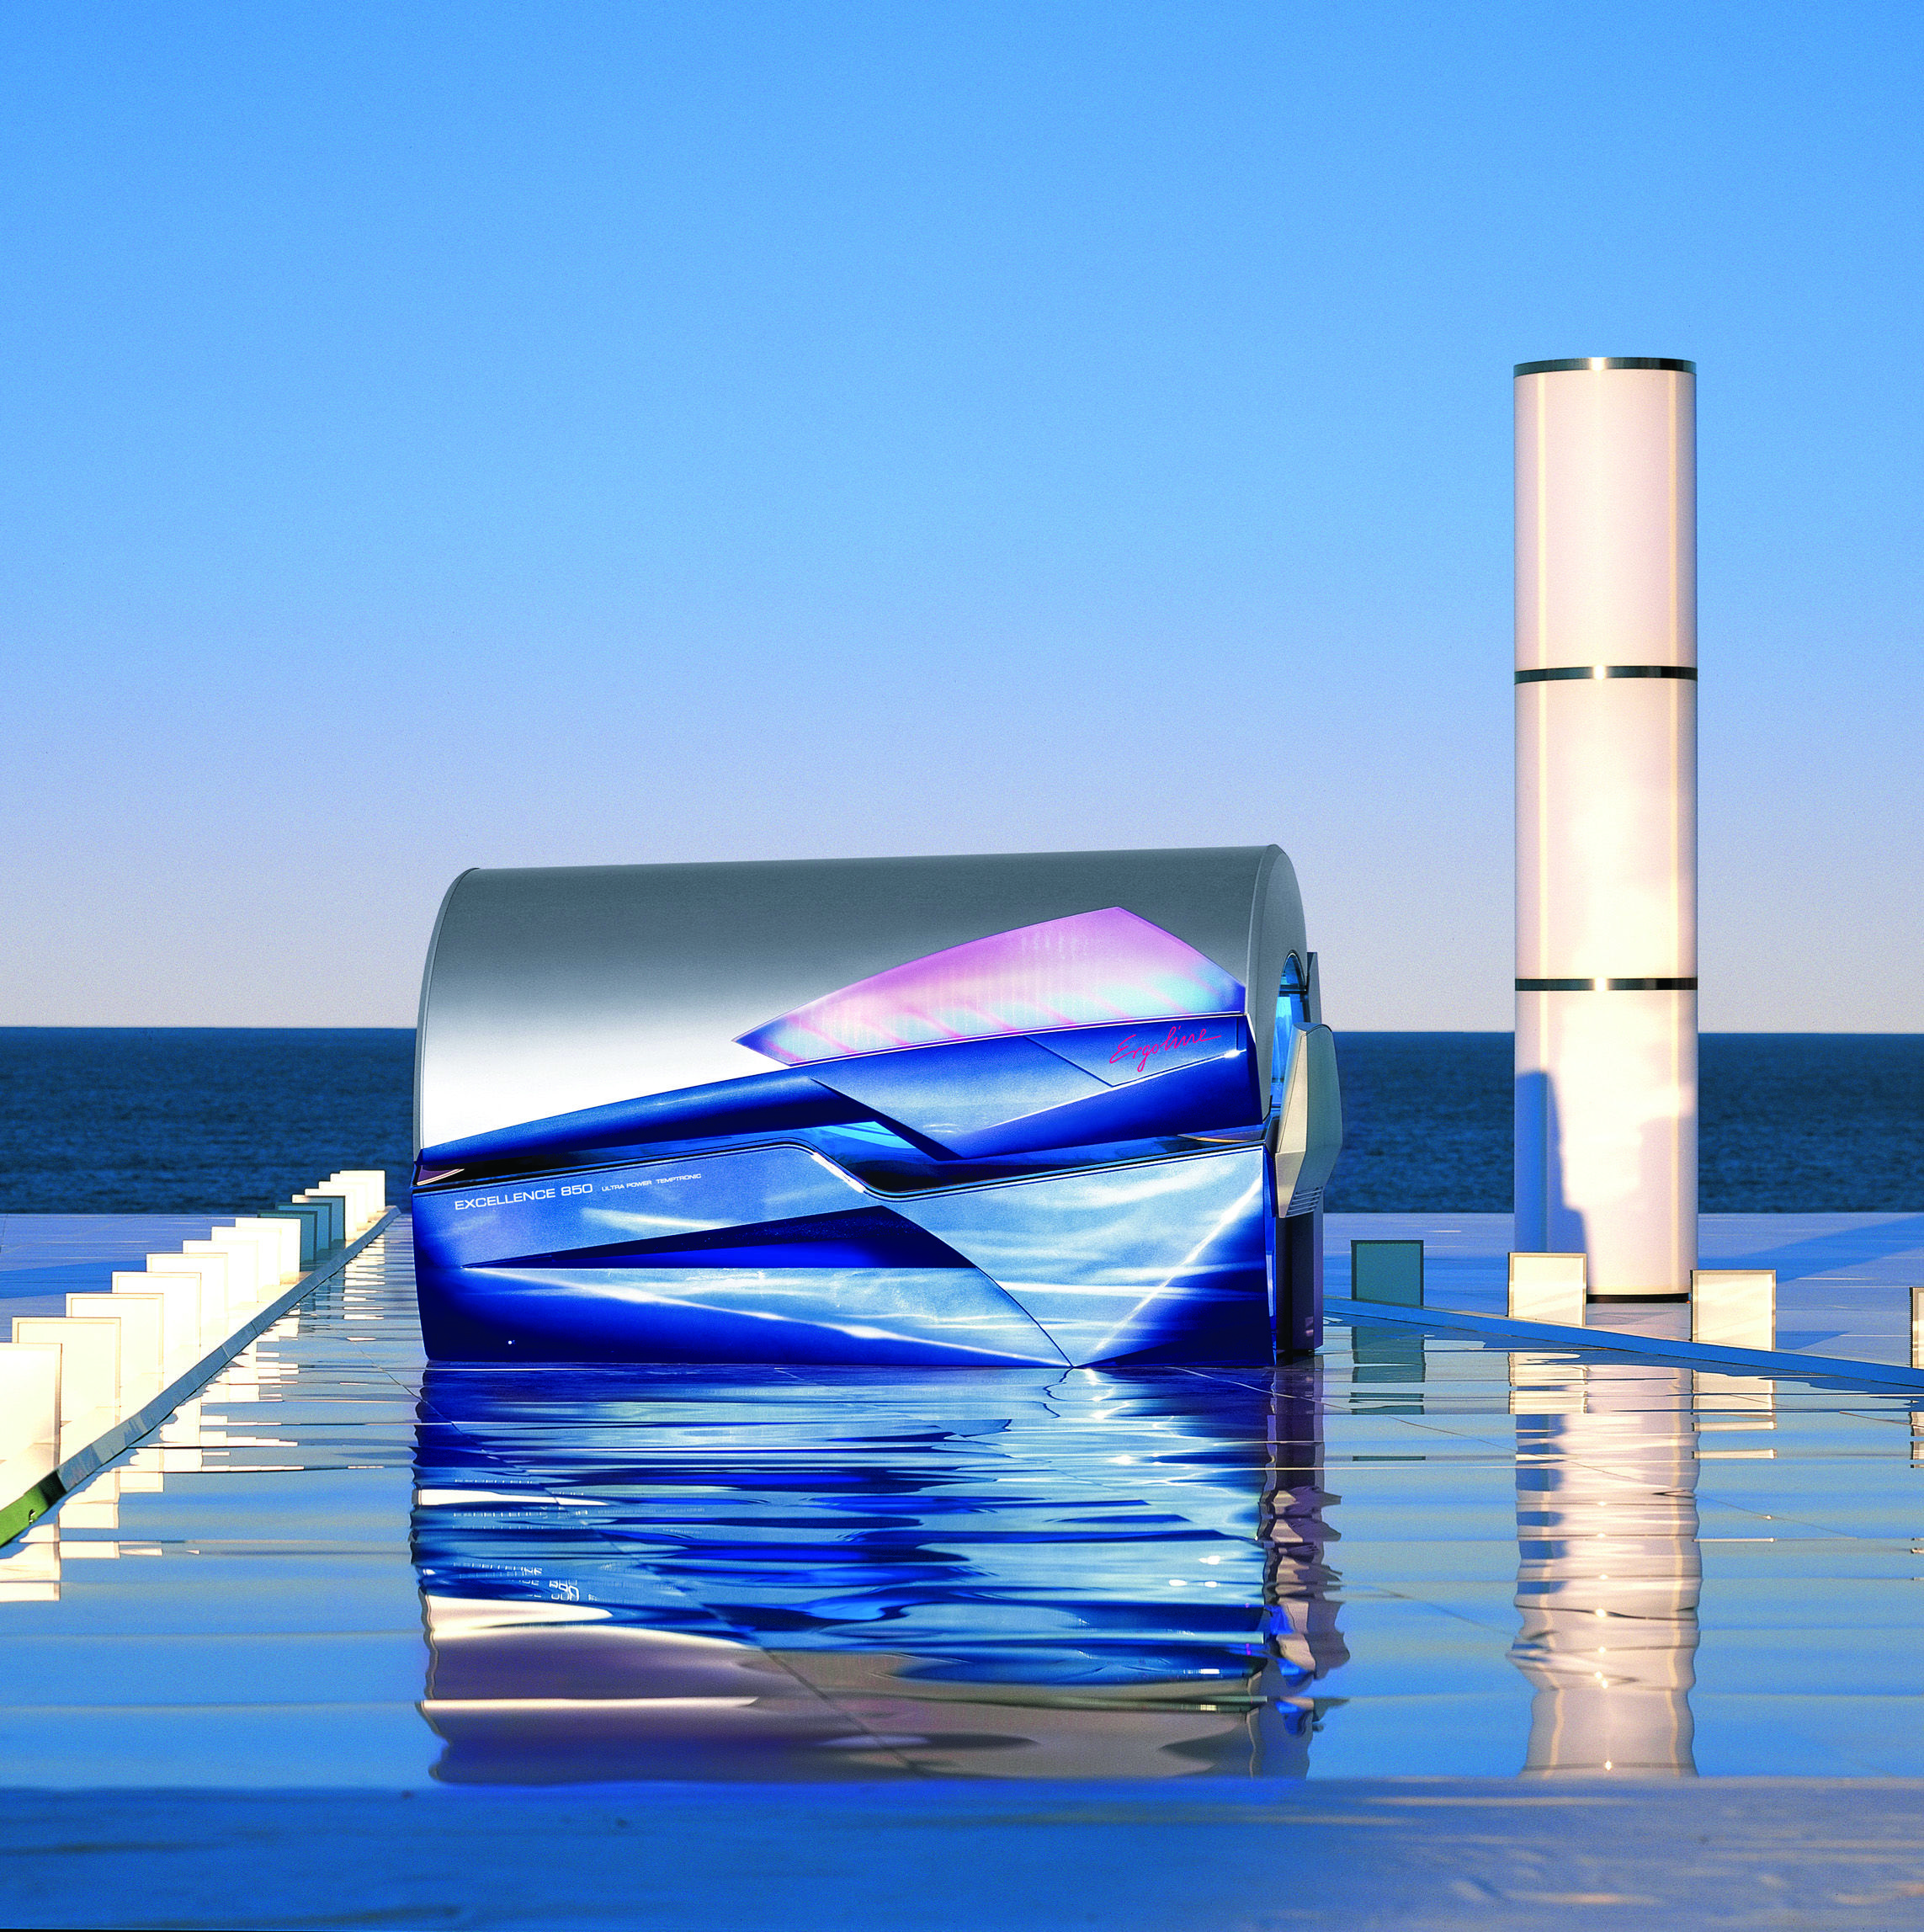 Ergoline 850 Uv tanning beds, Tanning bed, Abstract artwork